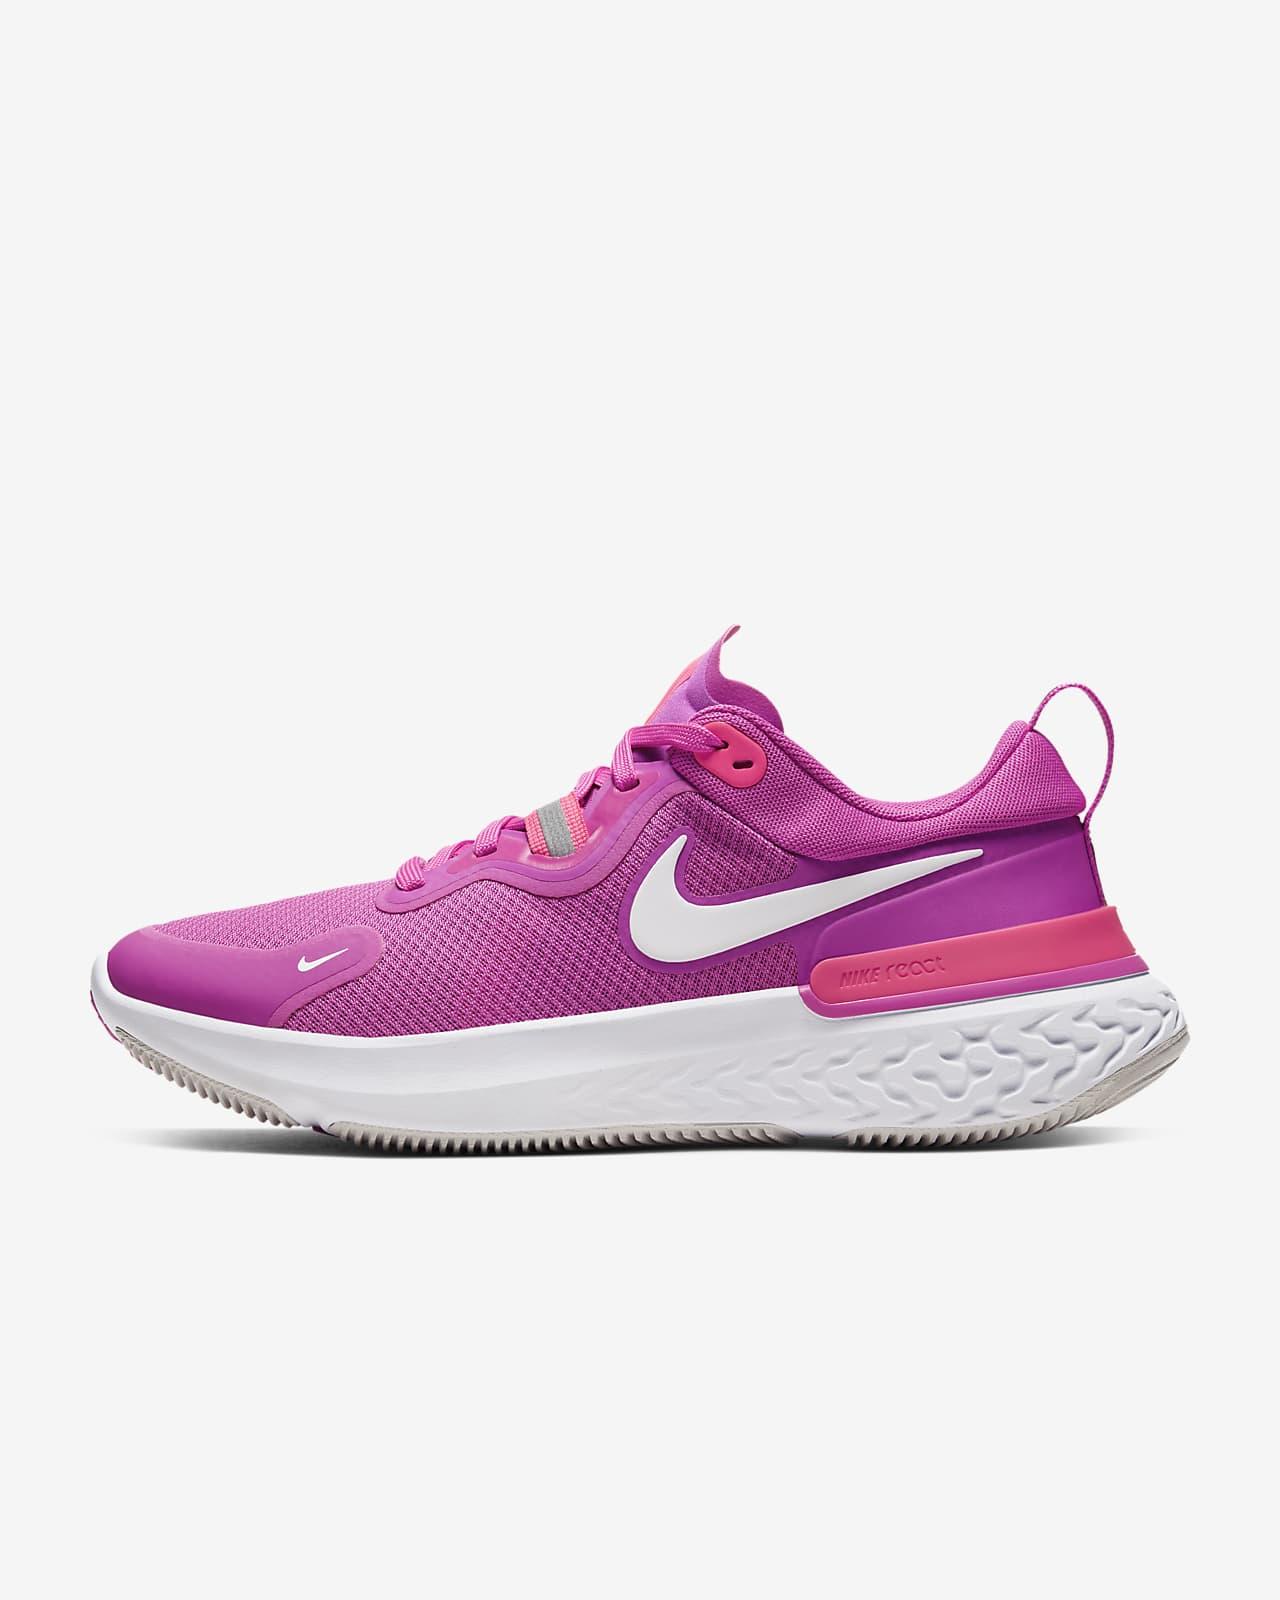 Damskie buty do biegania Nike React Miler